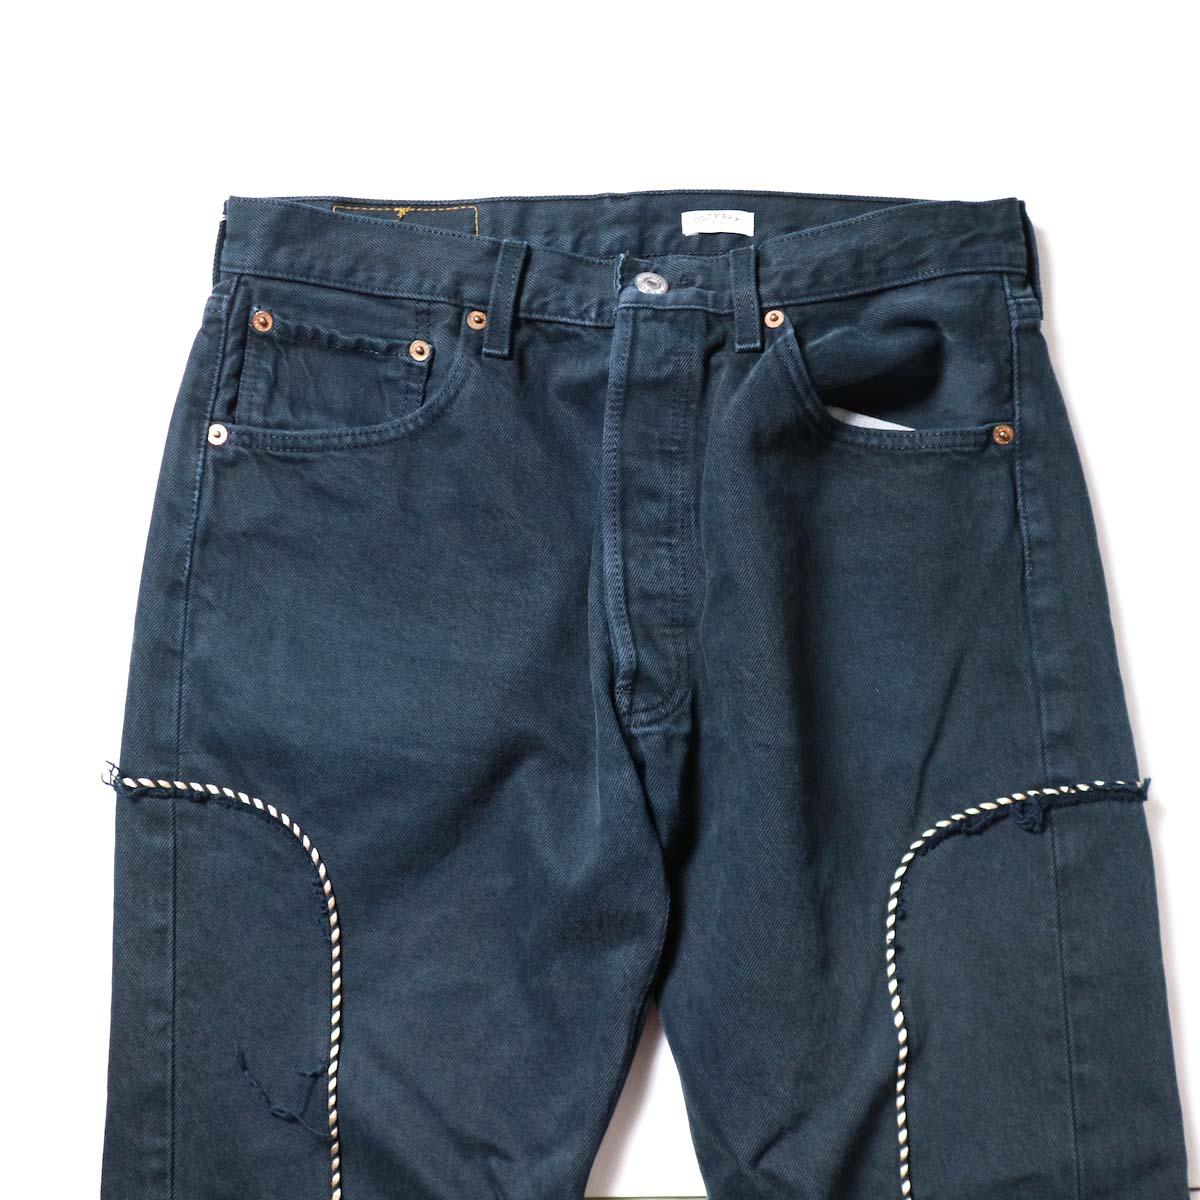 OLD PARK / Western Jeans Black (Msize-H)ウエスト